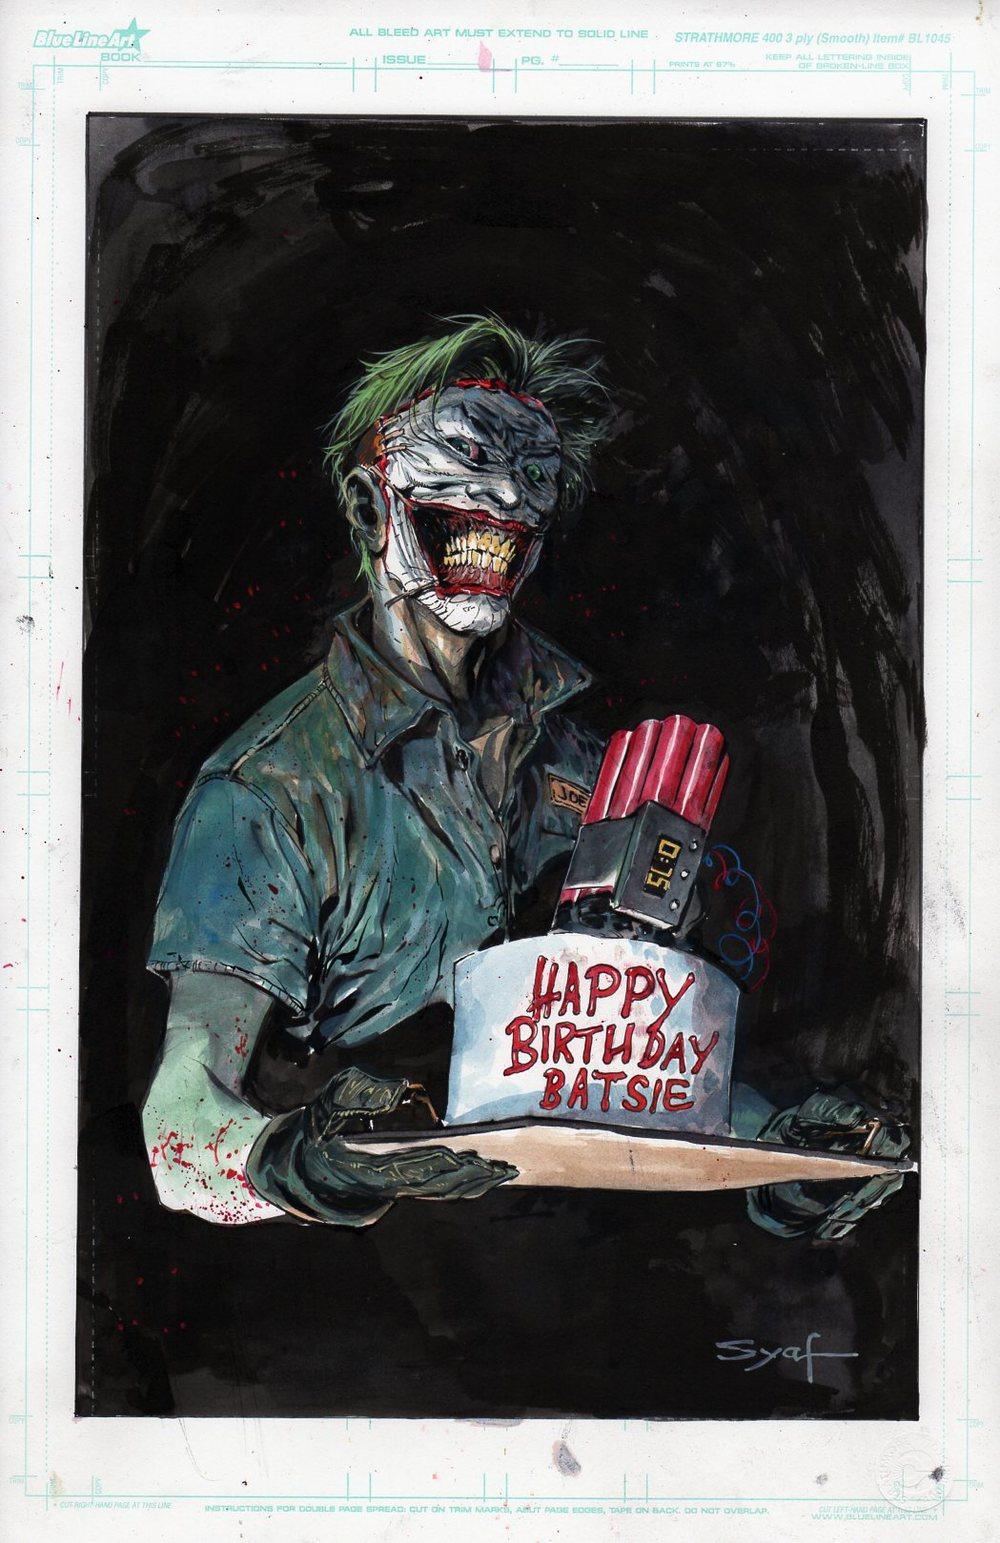 the_killing_cake_by_ardian_syaf-d7cama1.jpg